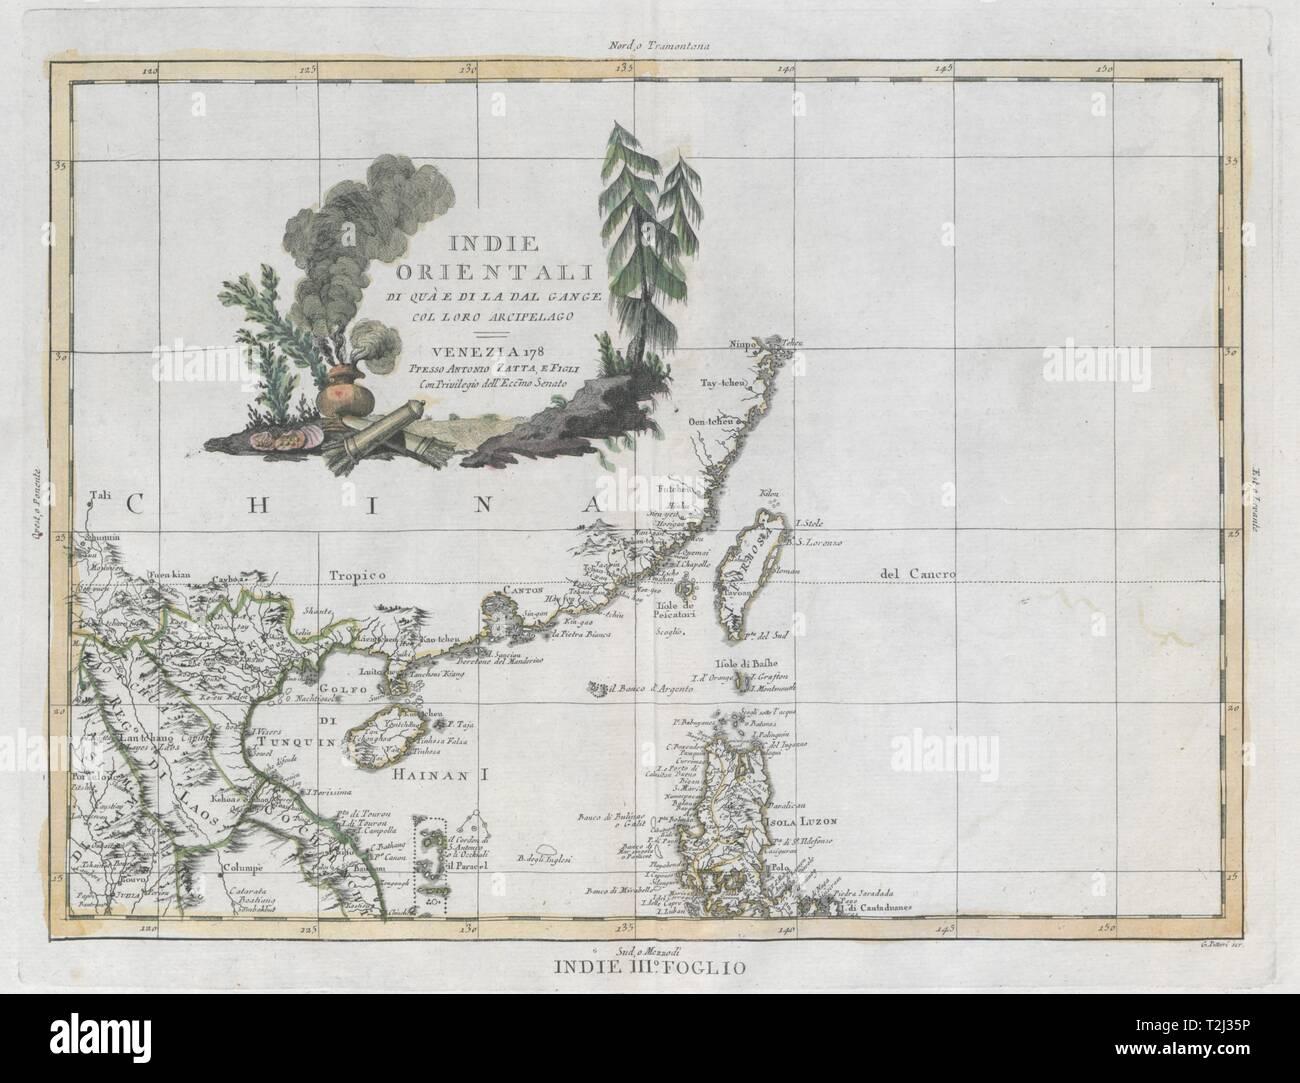 'Indie Orientali…' South China Sea. Luzon Guangdong Macao Hainan. ZATTA 1785 map - Stock Image